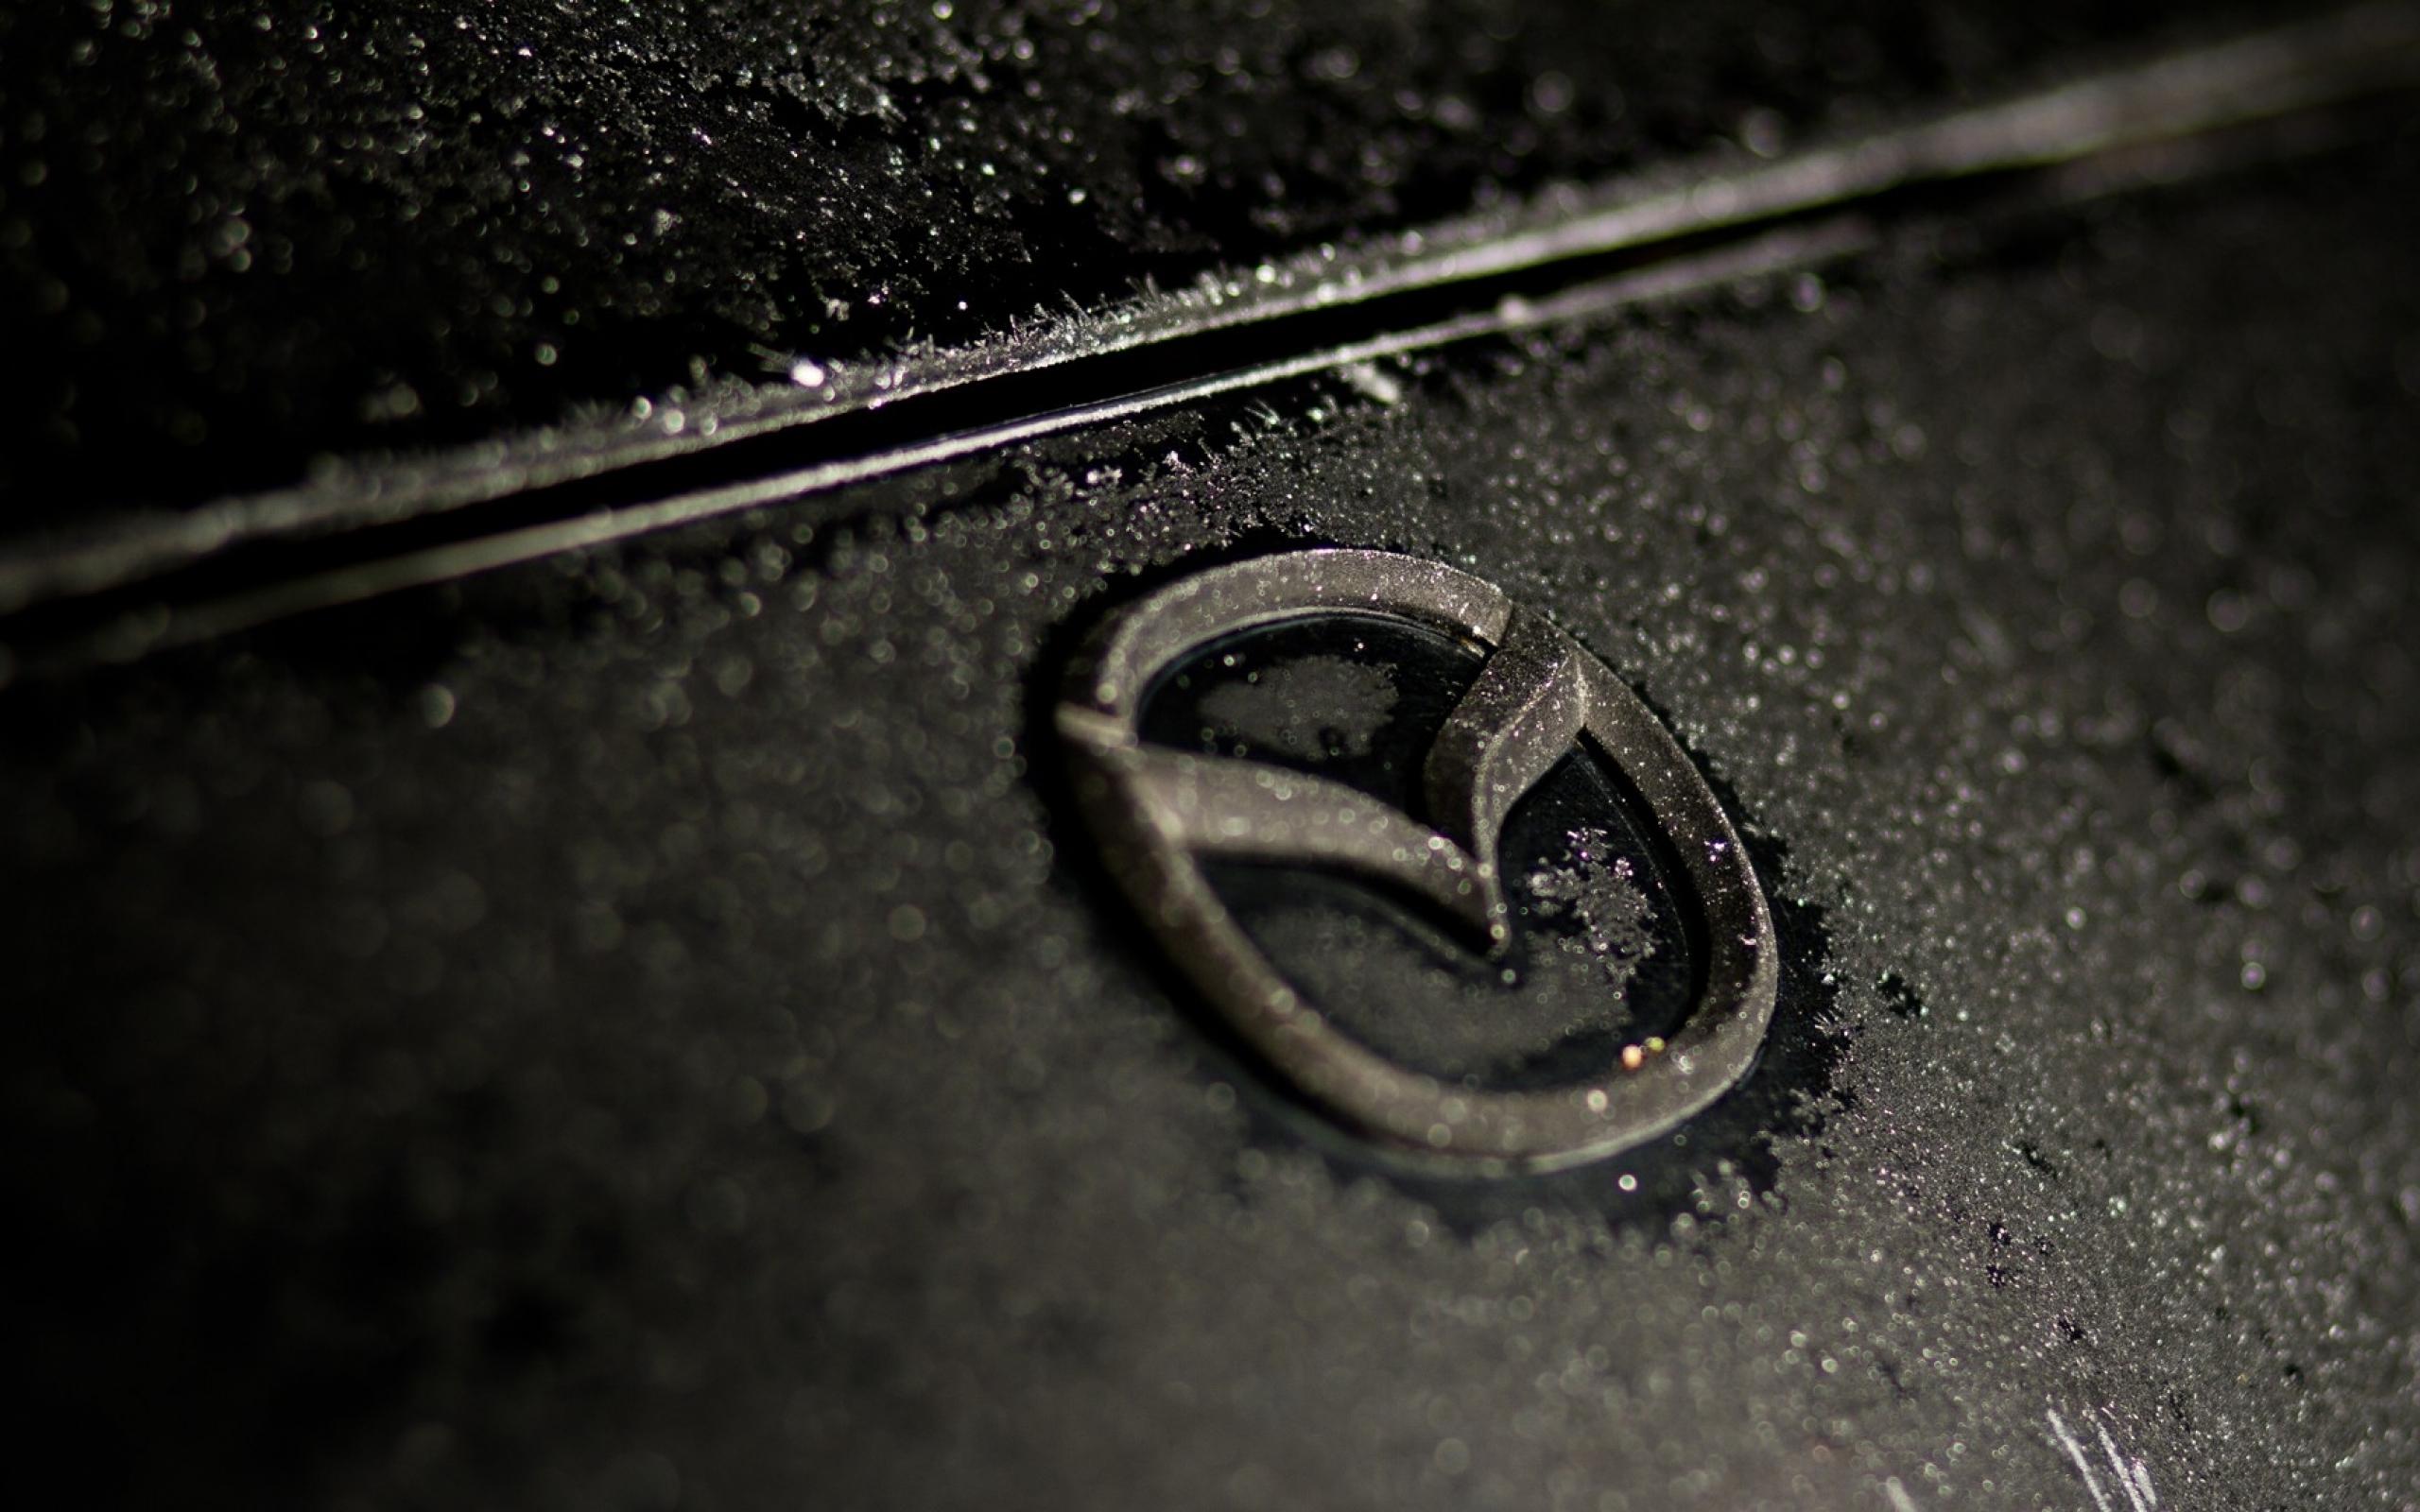 1920x1080 Hd Wallpaper Car Hud 3 Hd Mazda Logo Wallpapers